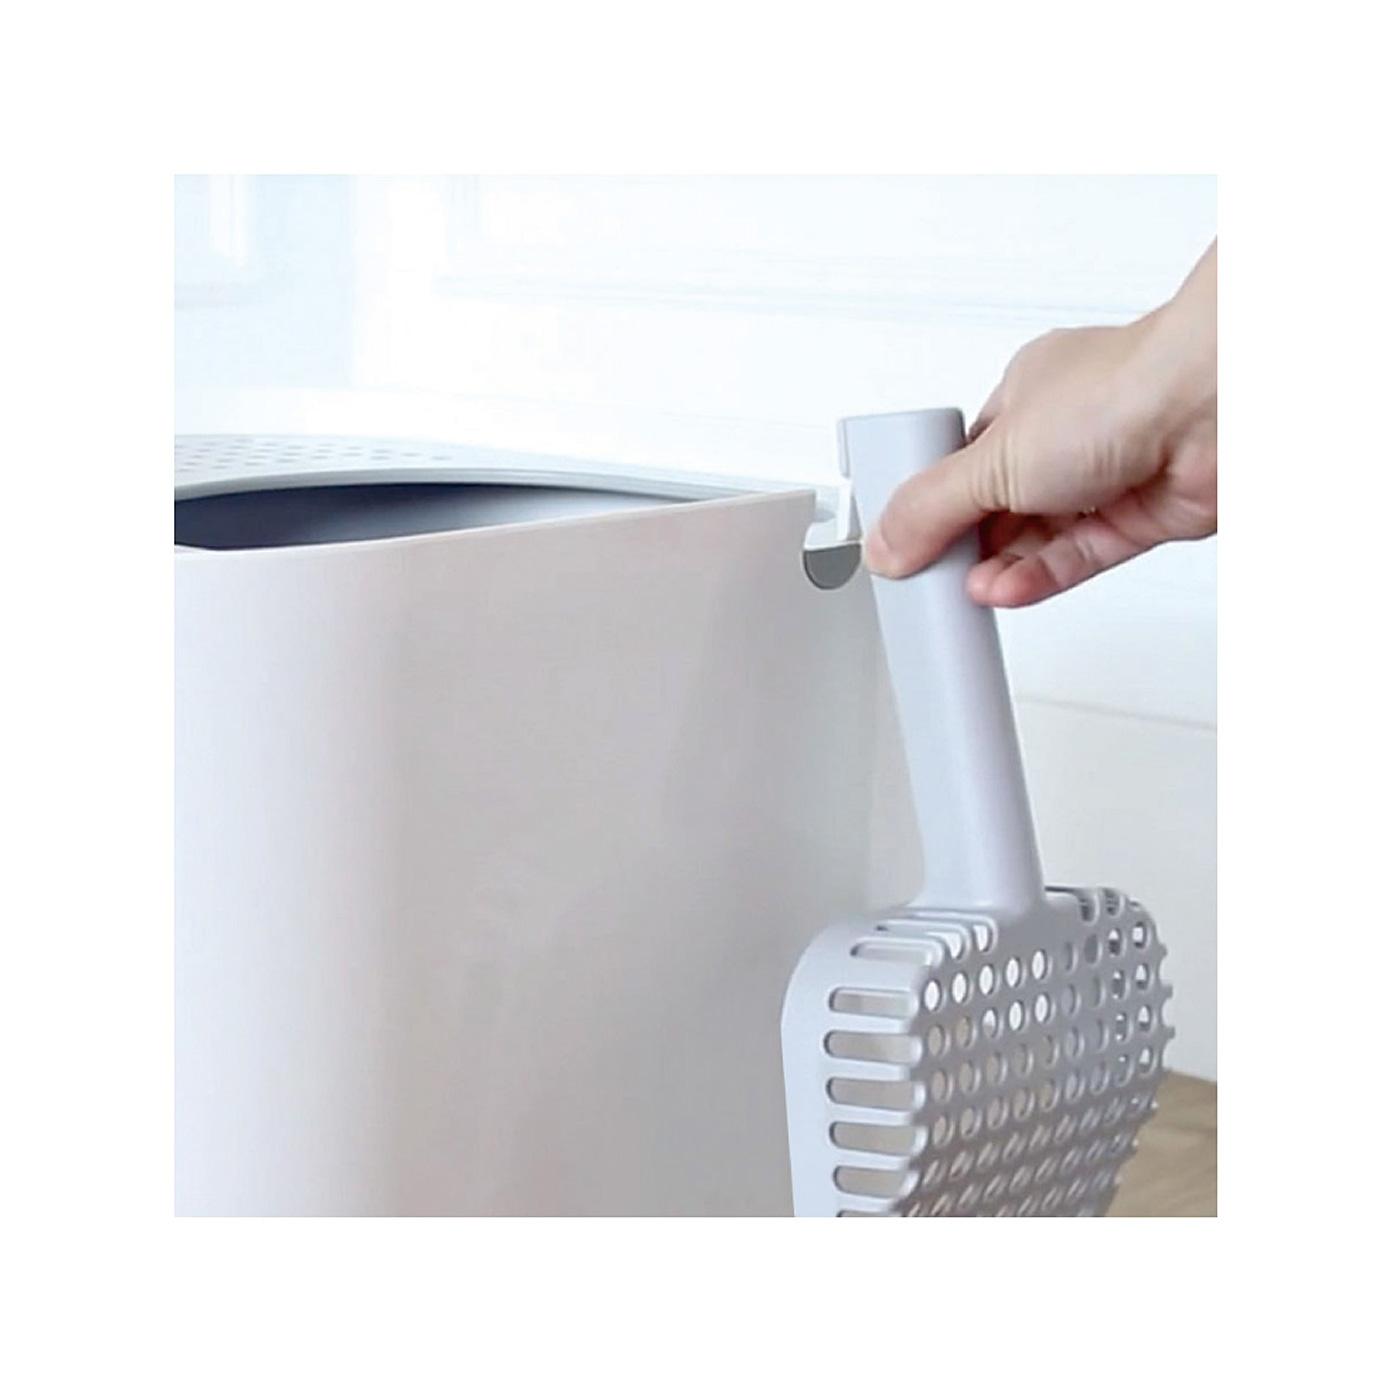 ABS樹脂なので、水洗いも可能です。